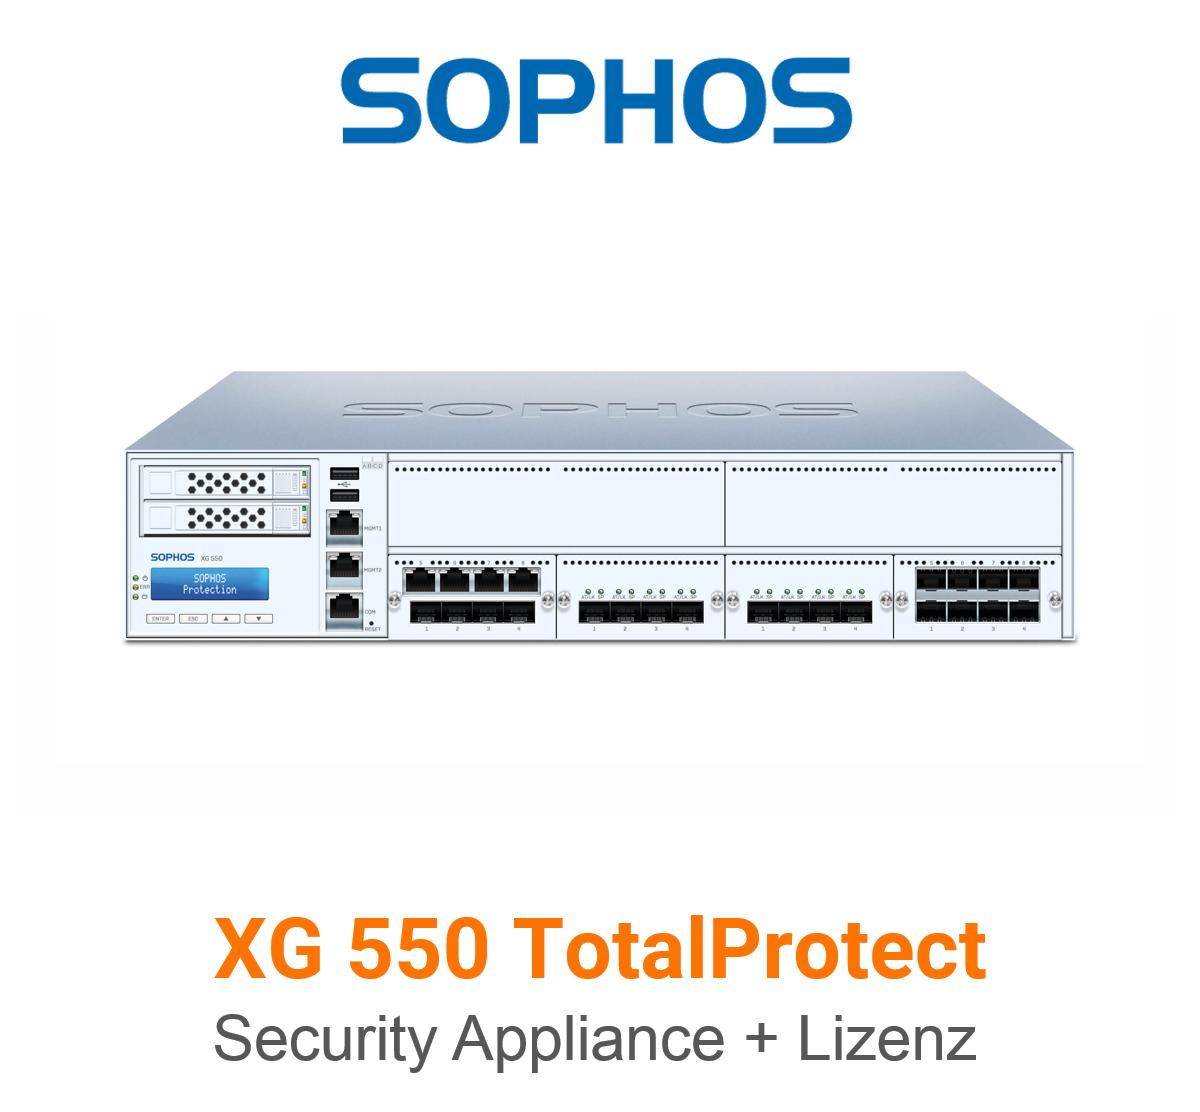 Sophos XG 550 TotalProtect Bundle (Hardware + Lizenz)